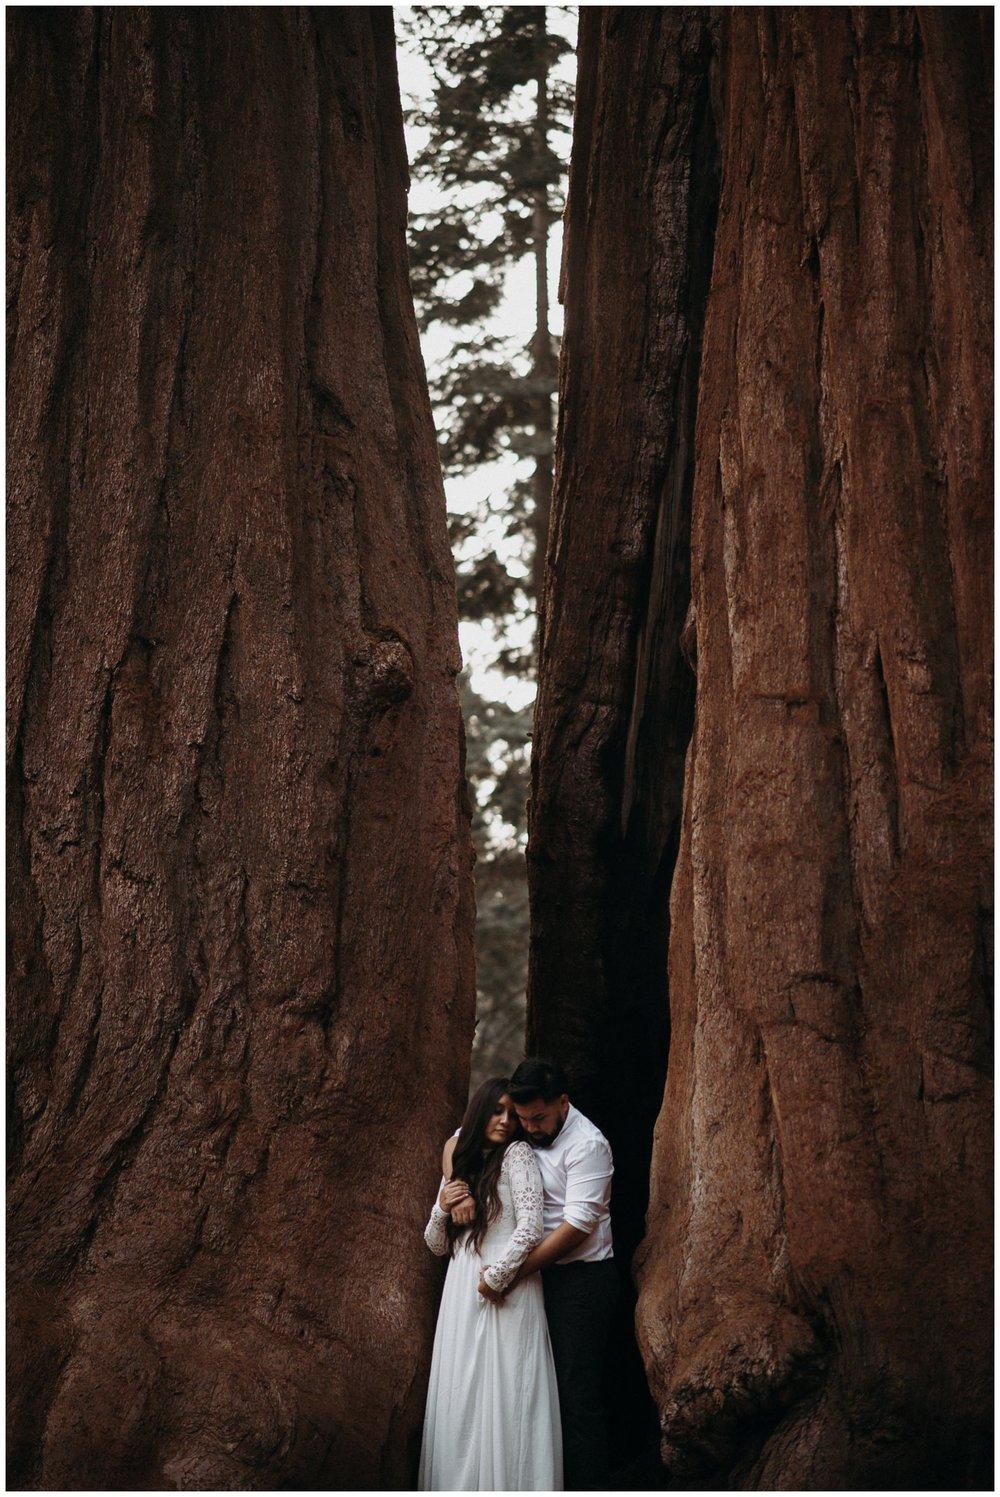 Sequoia_National_Park_Engagement__0026.jpg